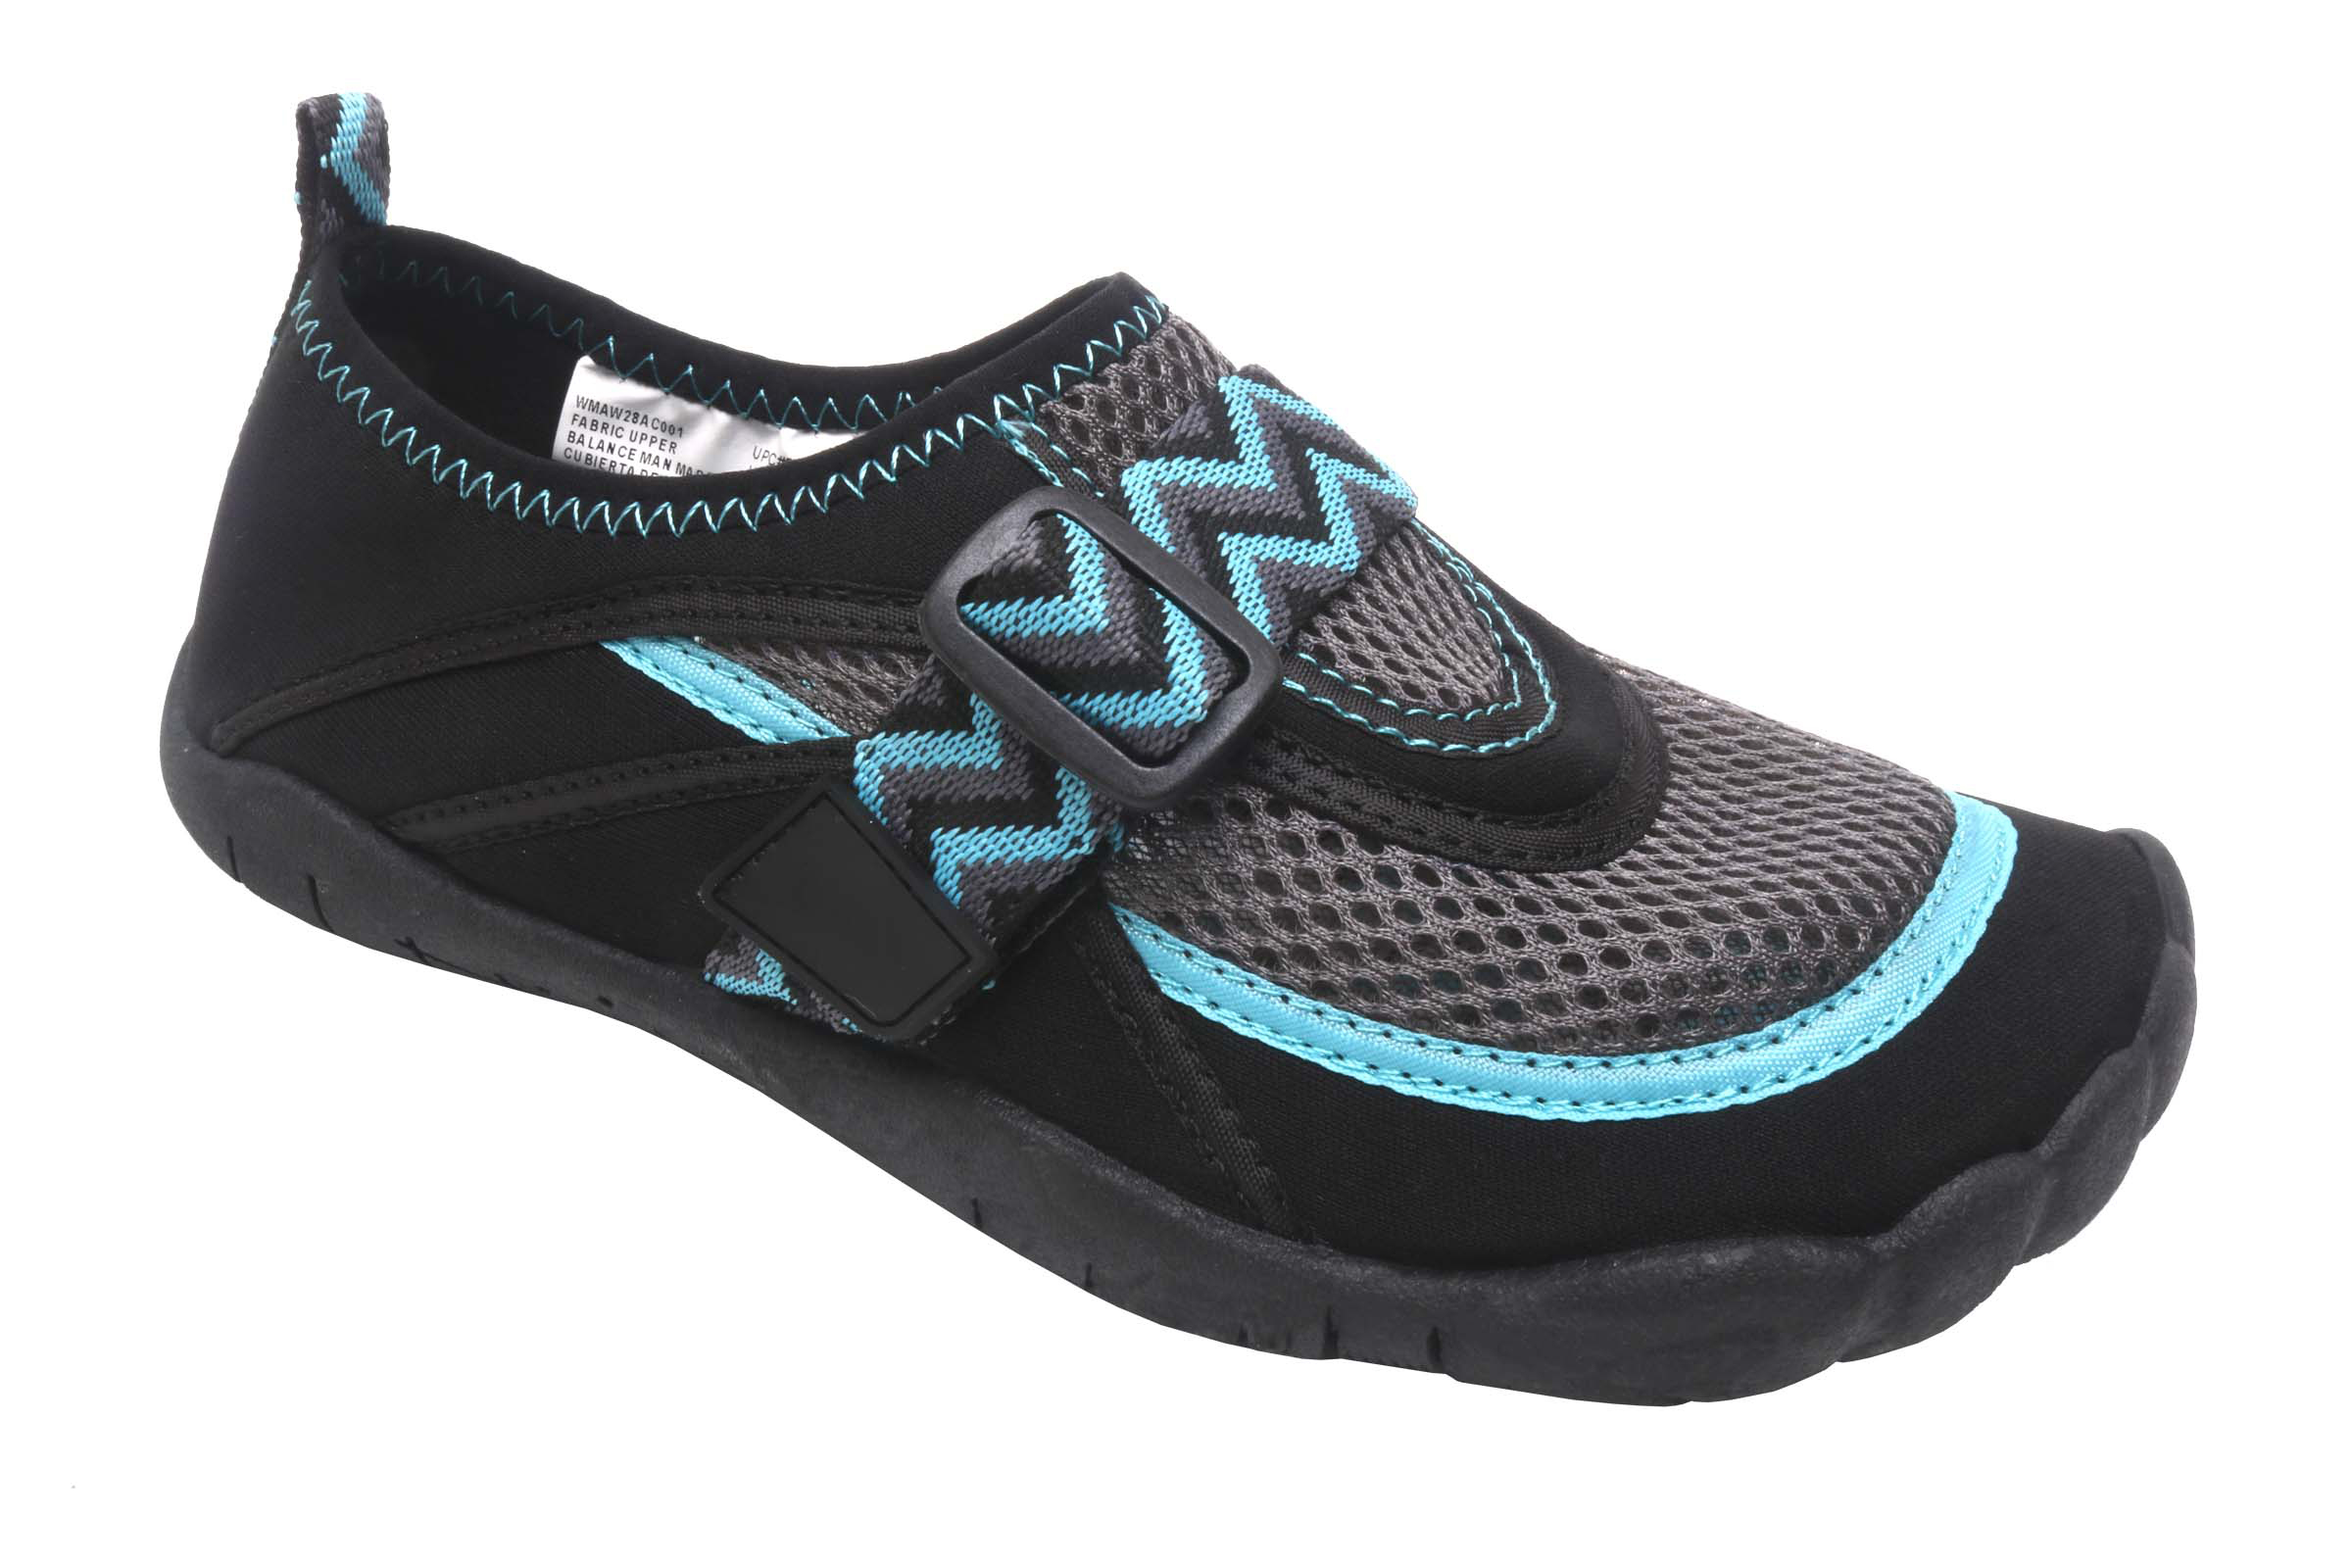 Athletic Works - Athletic Works Women's Aqua Shoes - Walmart.com -  Walmart.com